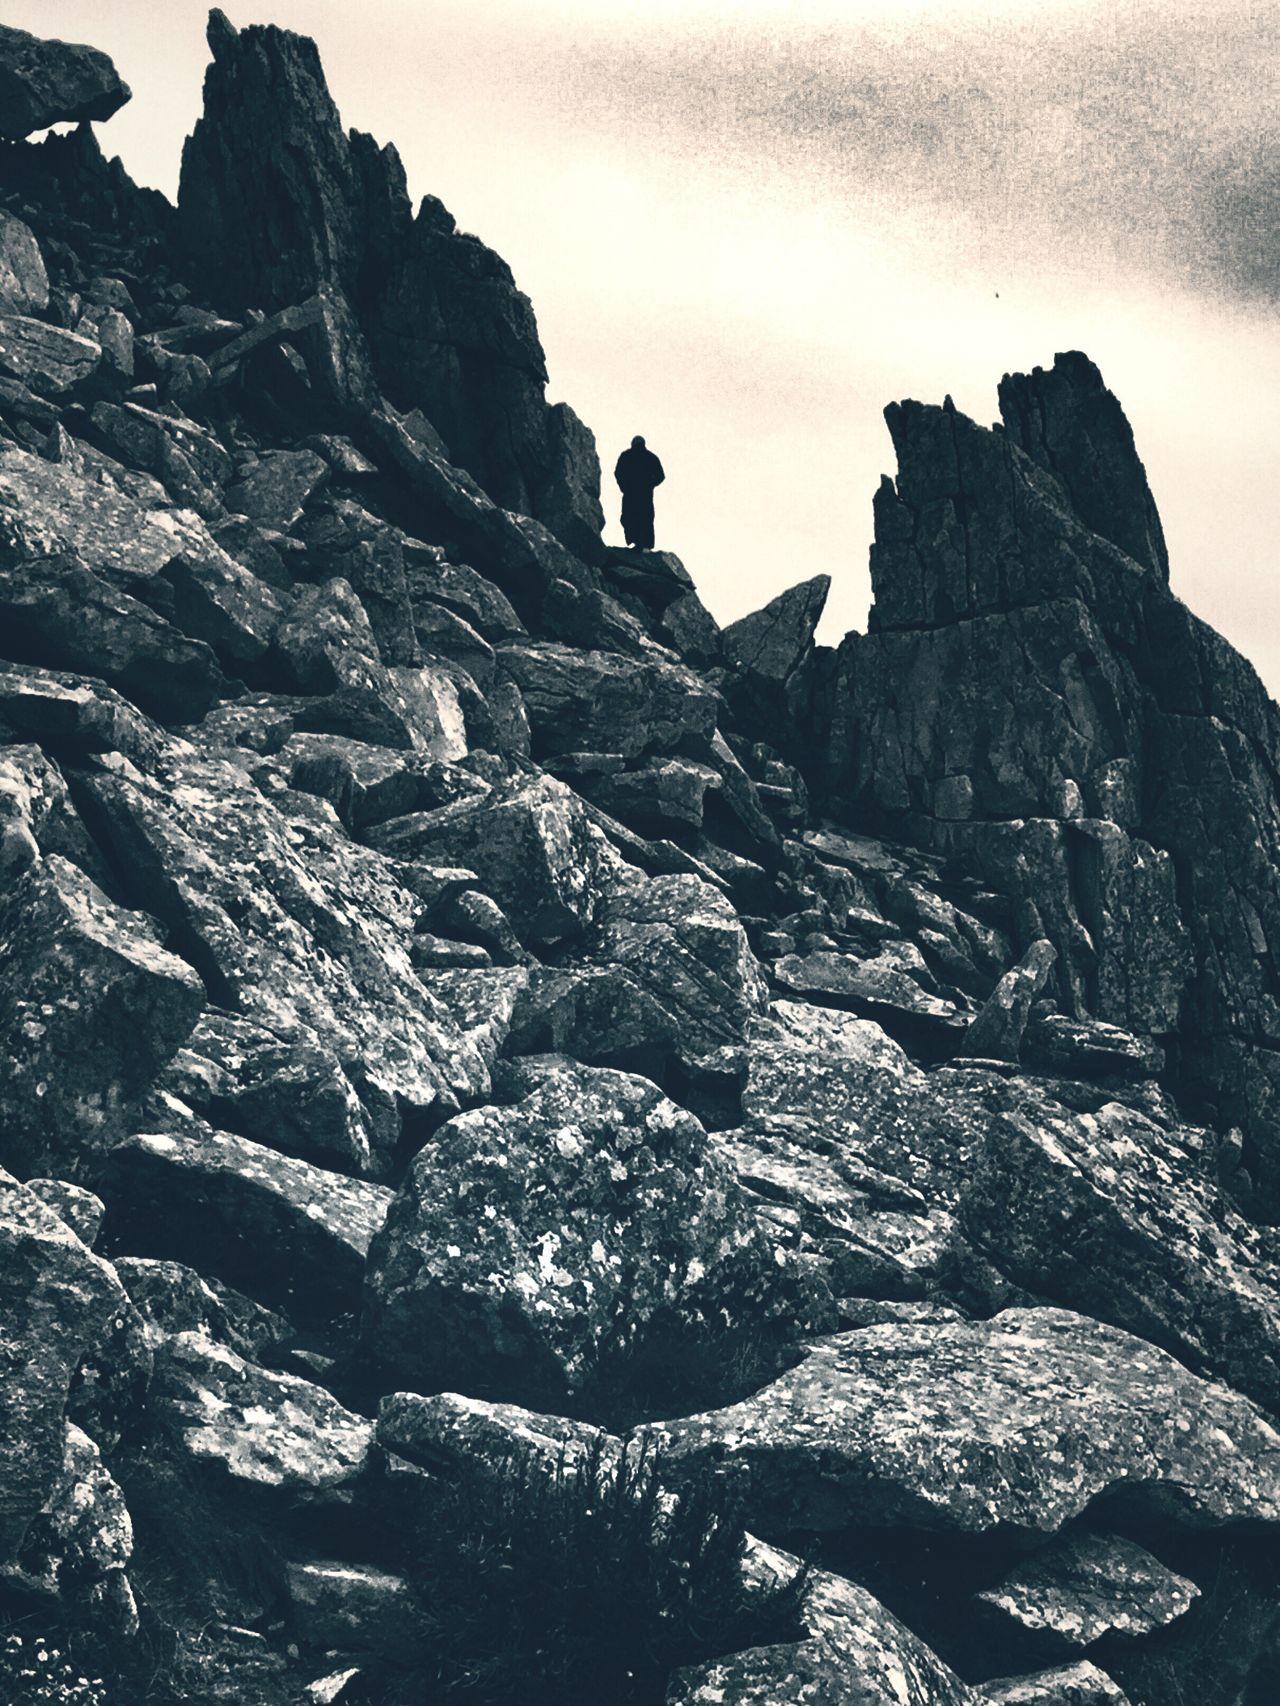 Among The Rocks Cliffs Rocks Blackandwhite Alone